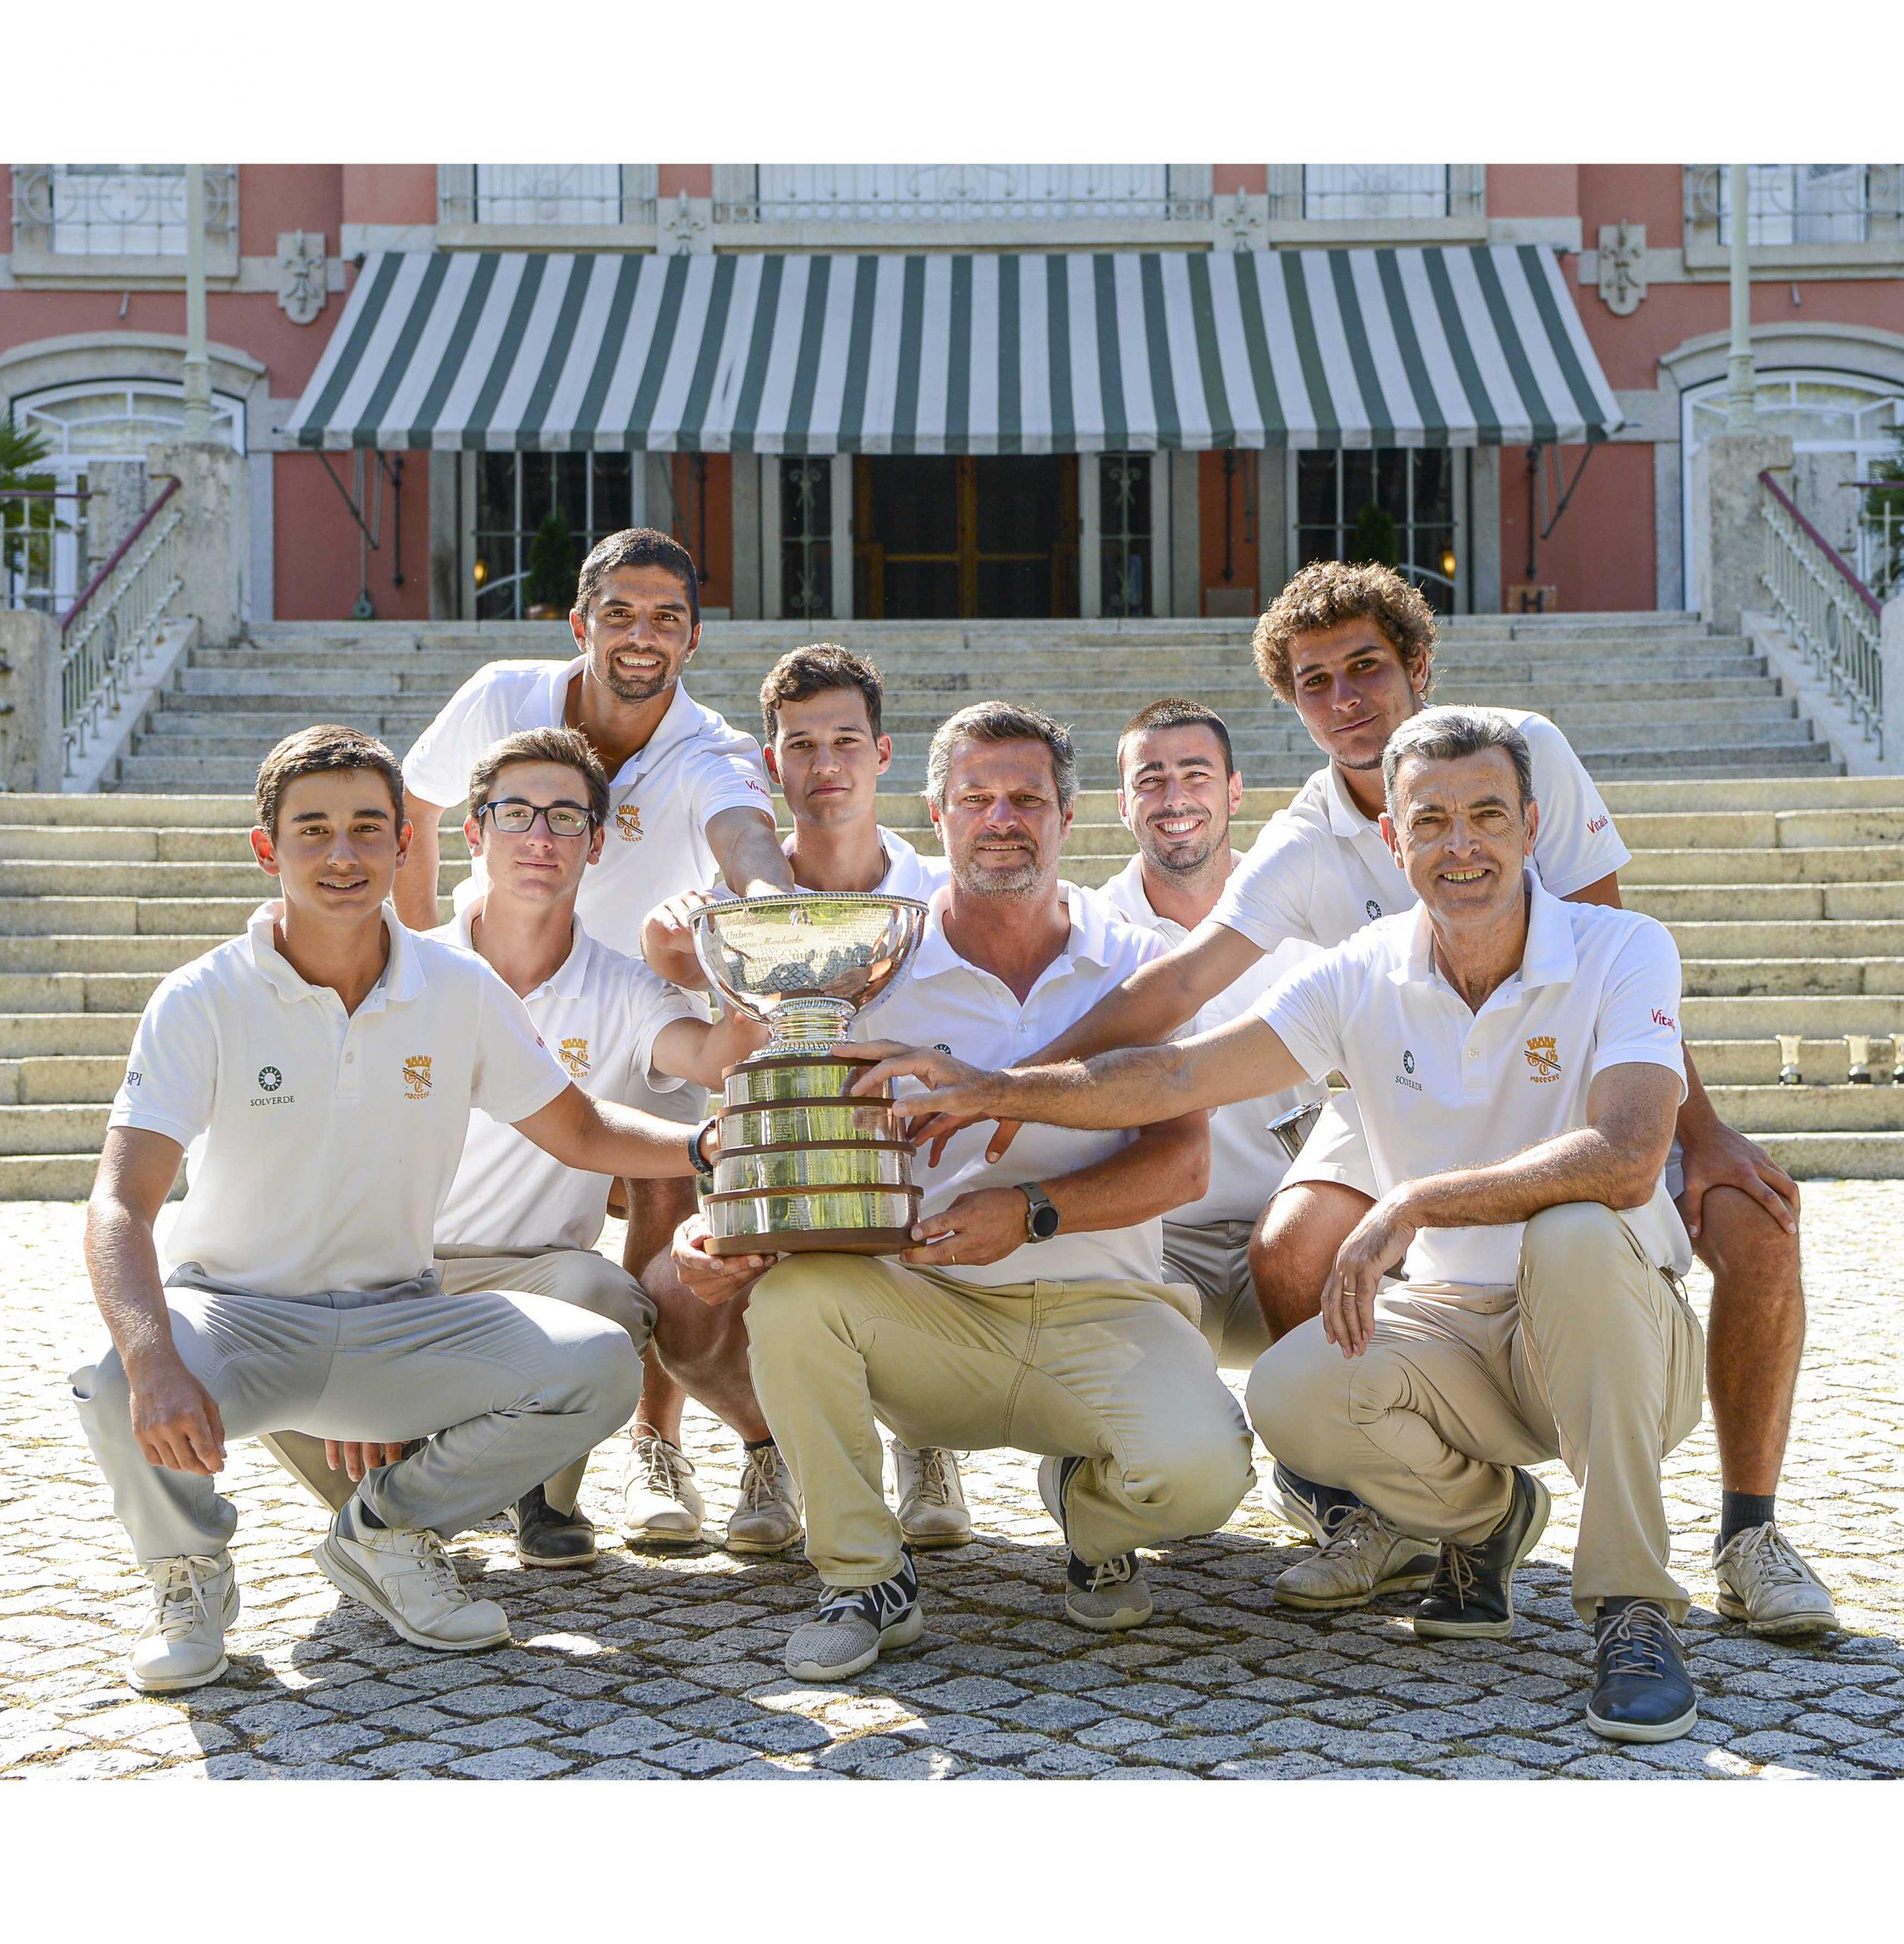 58.º Campeonato Nacional de Clubes Solverde – Oporto e Miramar sagram-se campeões nacionais de clubes